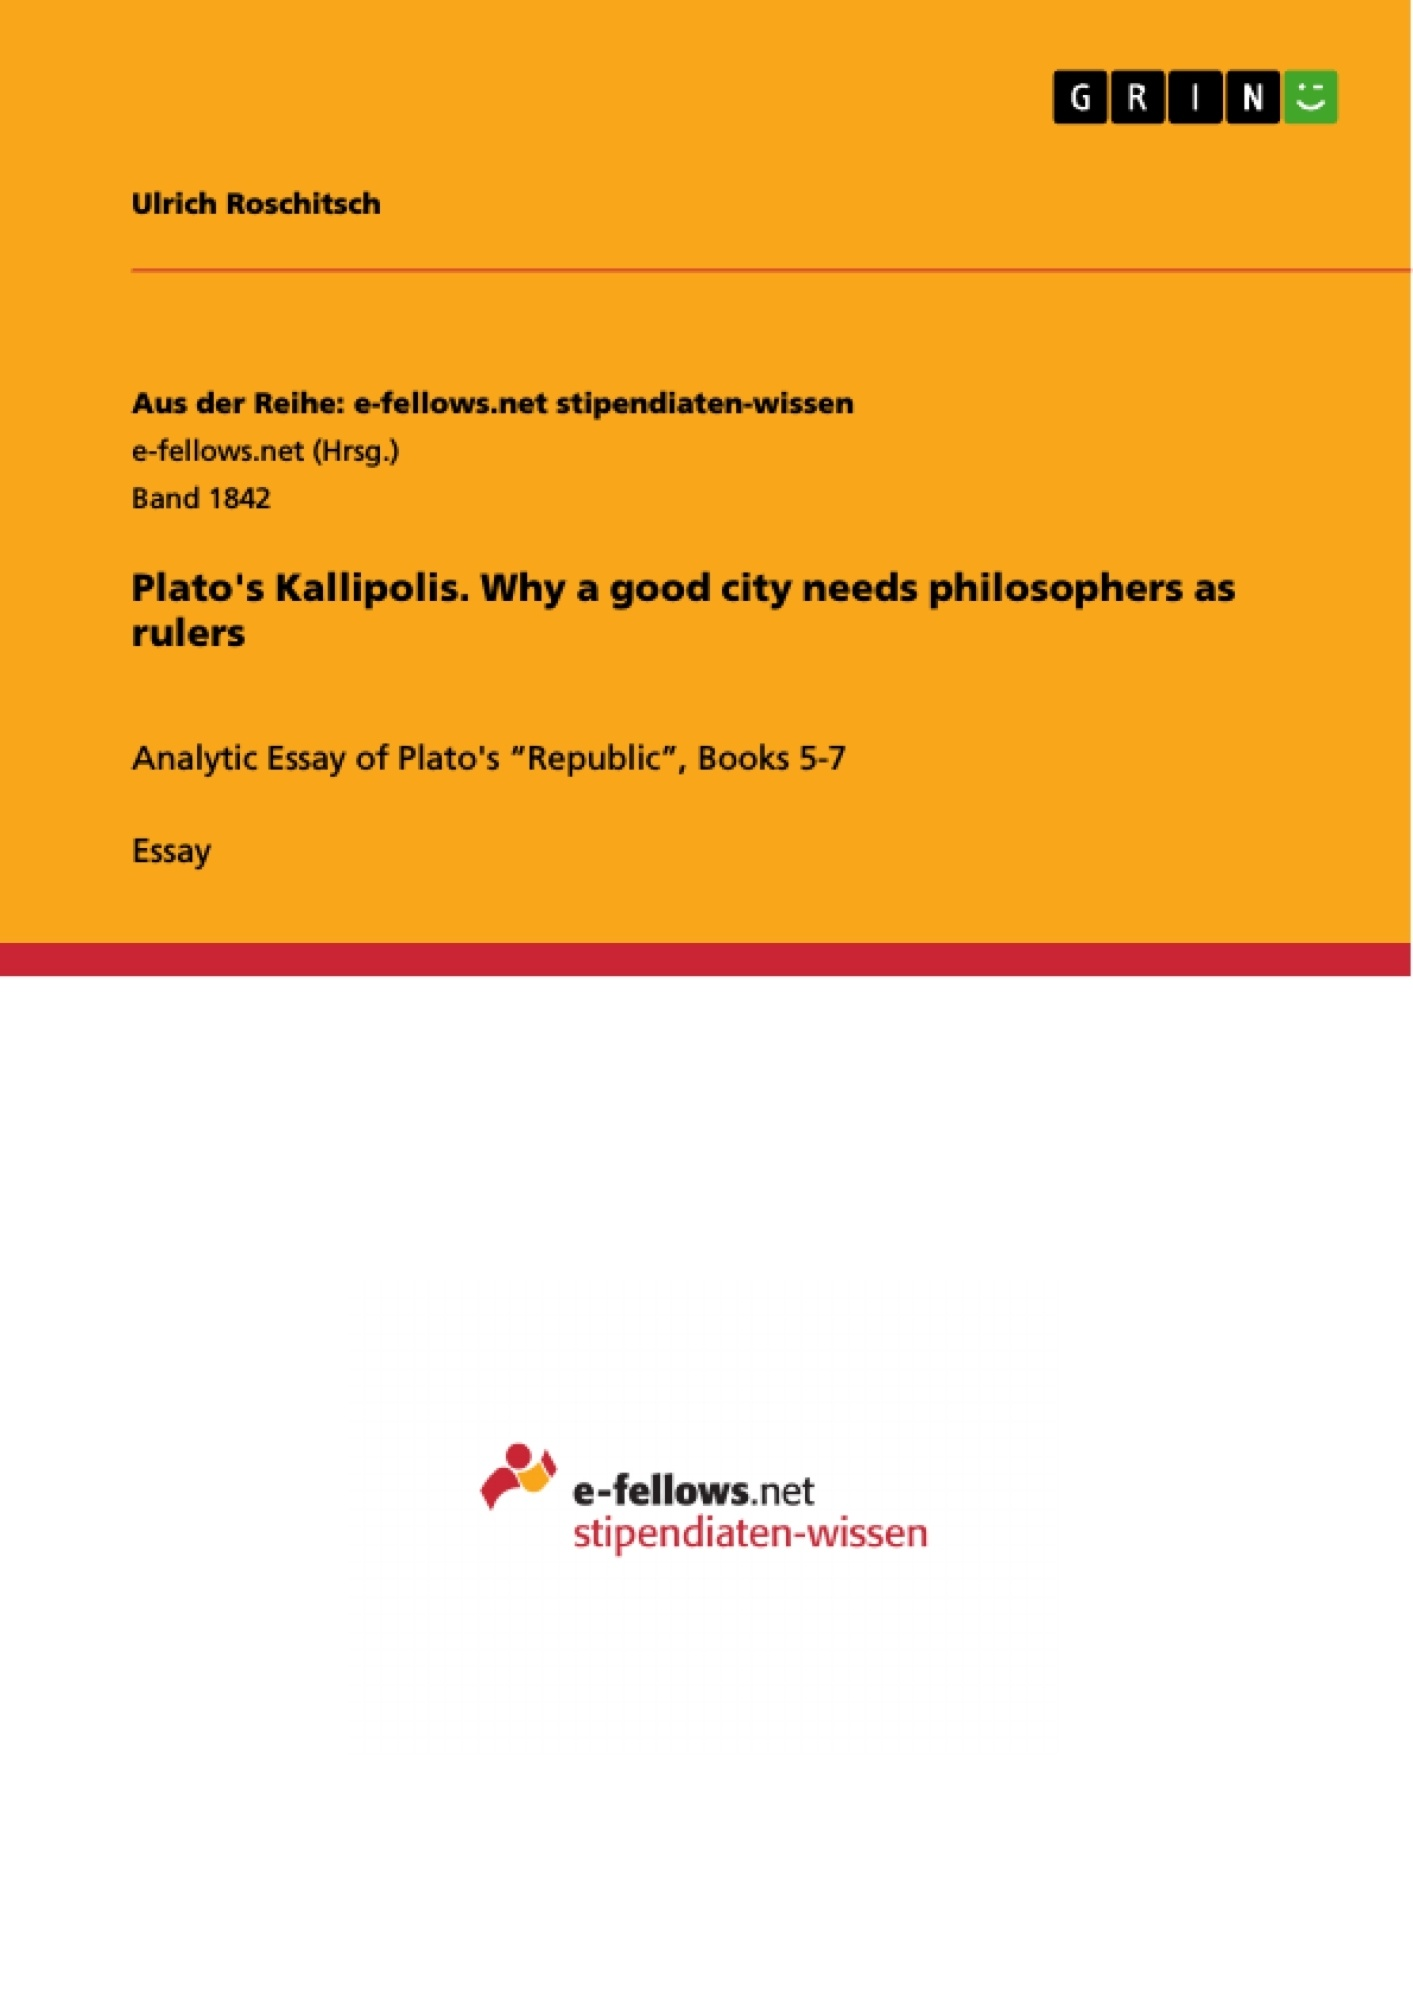 Titel: Plato's Kallipolis. Why a good city needs philosophers as rulers